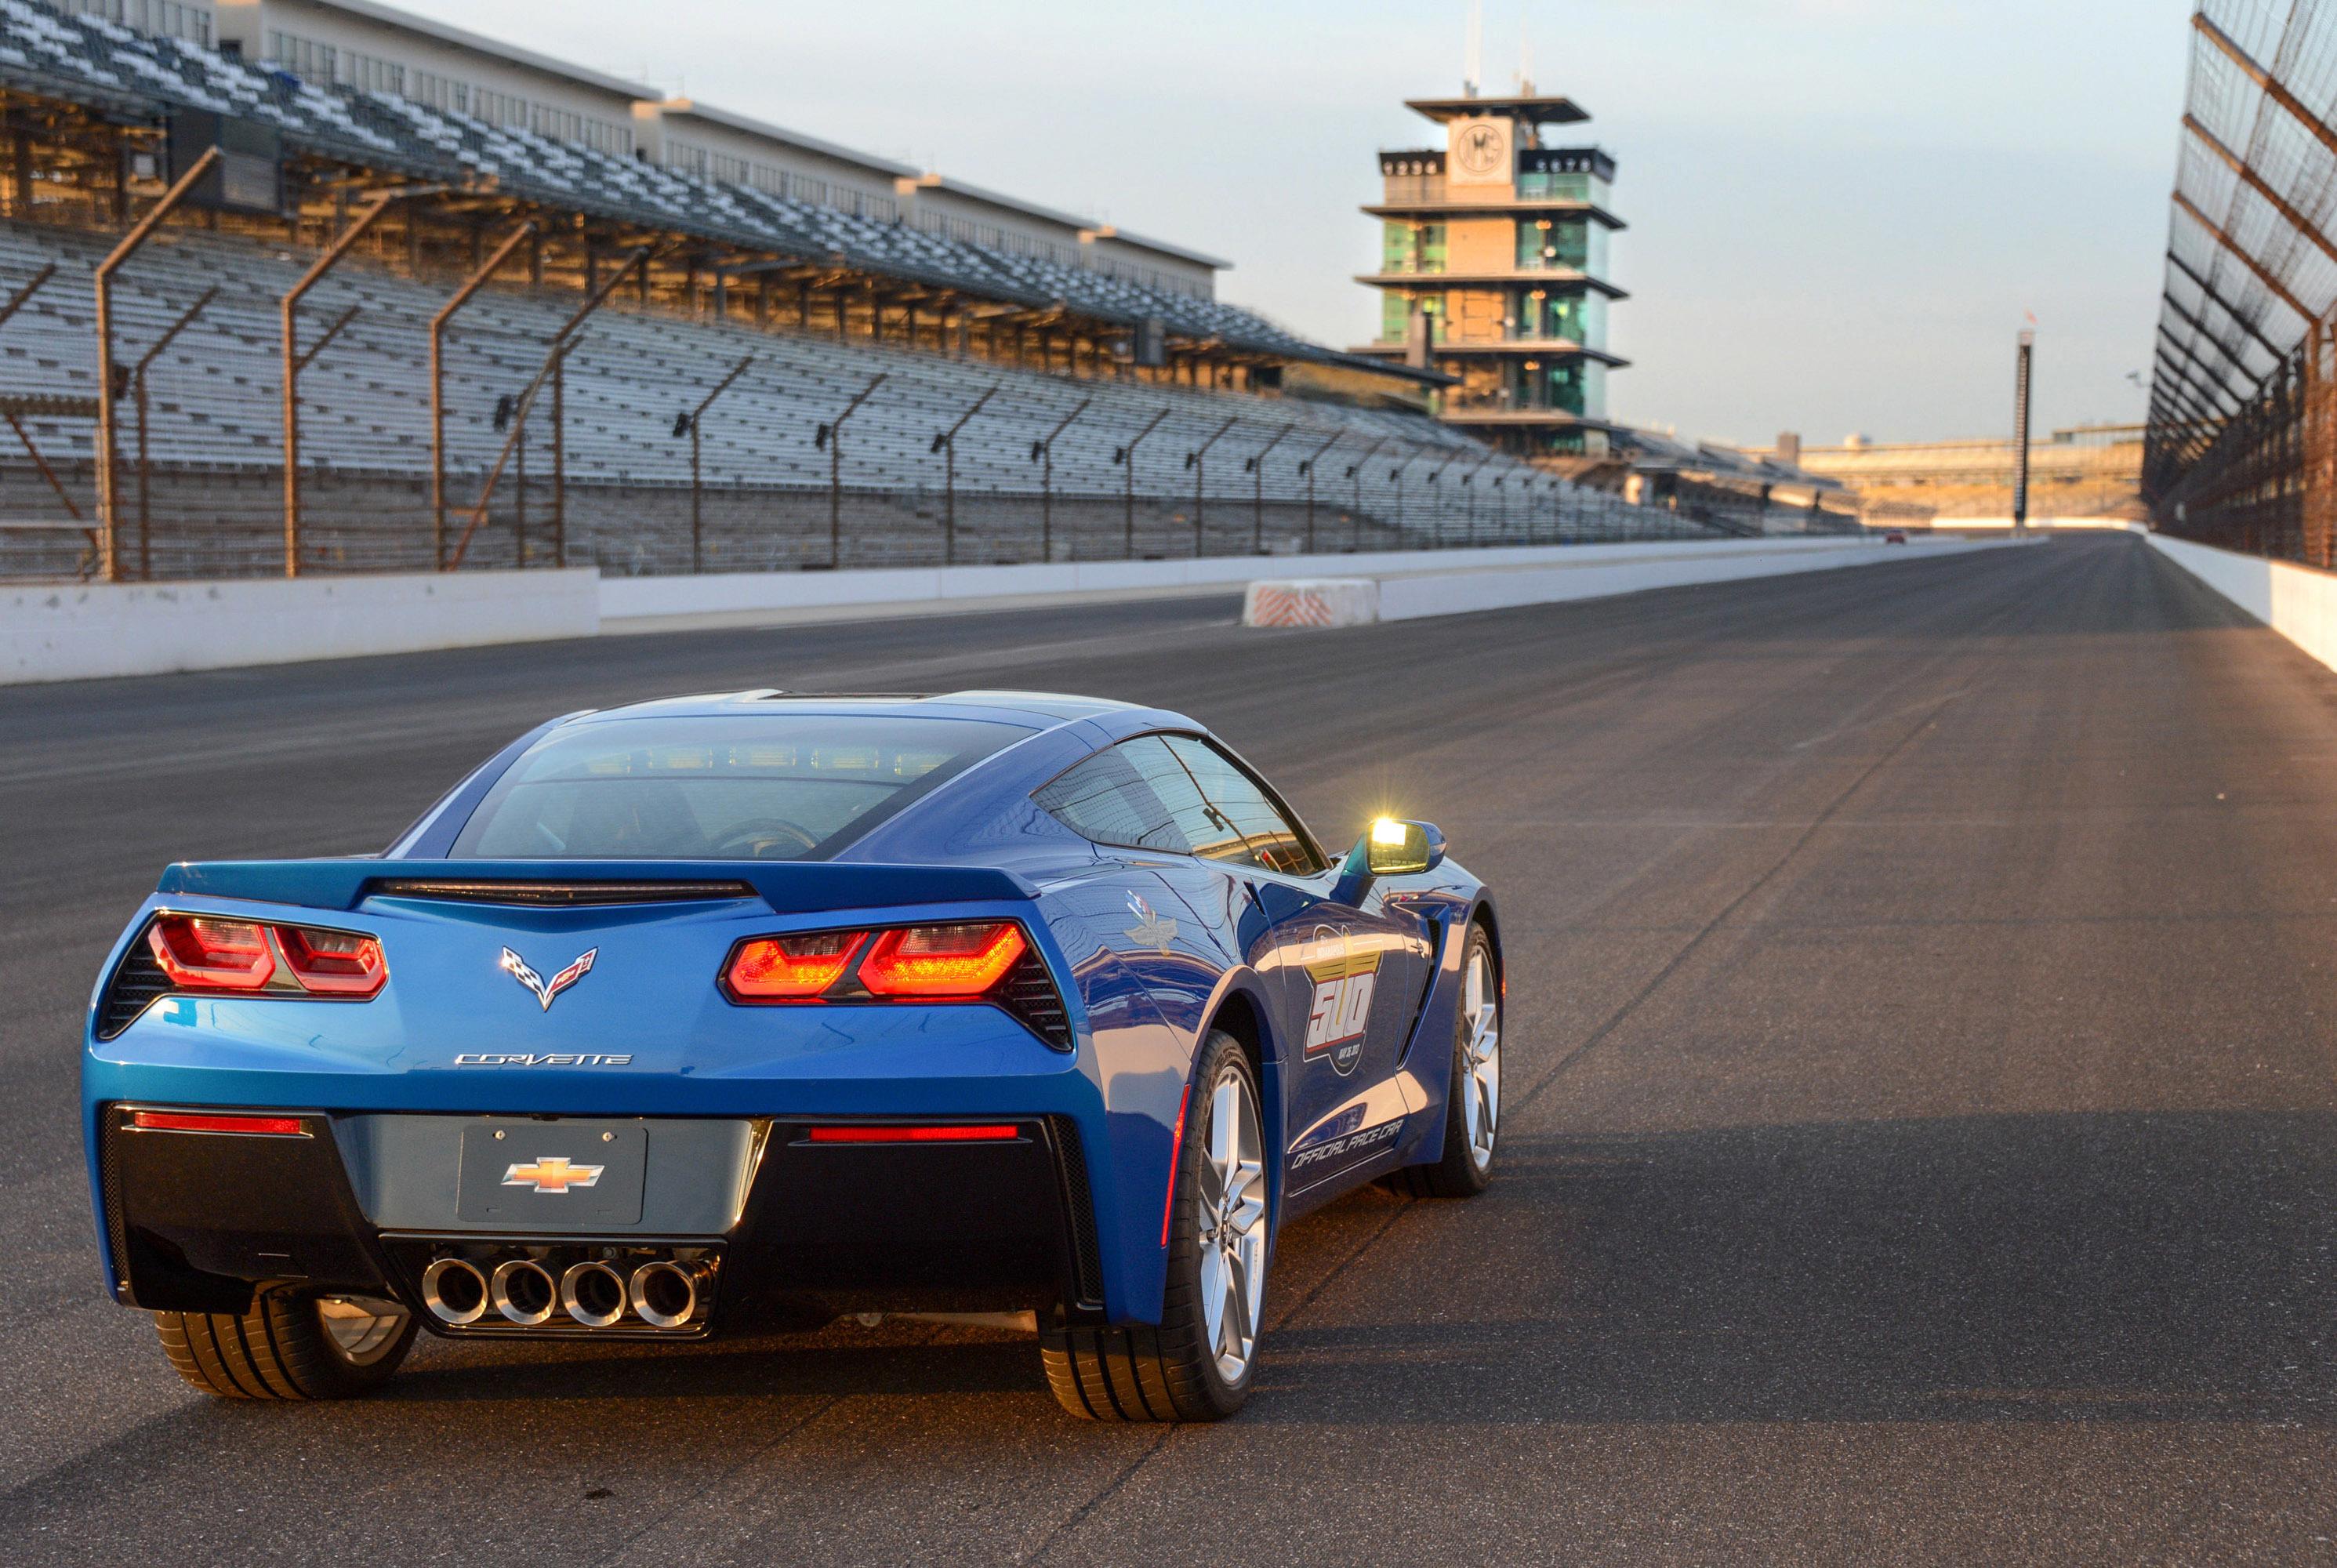 122864 скачать обои Тачки (Cars), Шевроле (Chevrolet), Corvette, Stingray, C7, Indy 500, Pace Car - заставки и картинки бесплатно